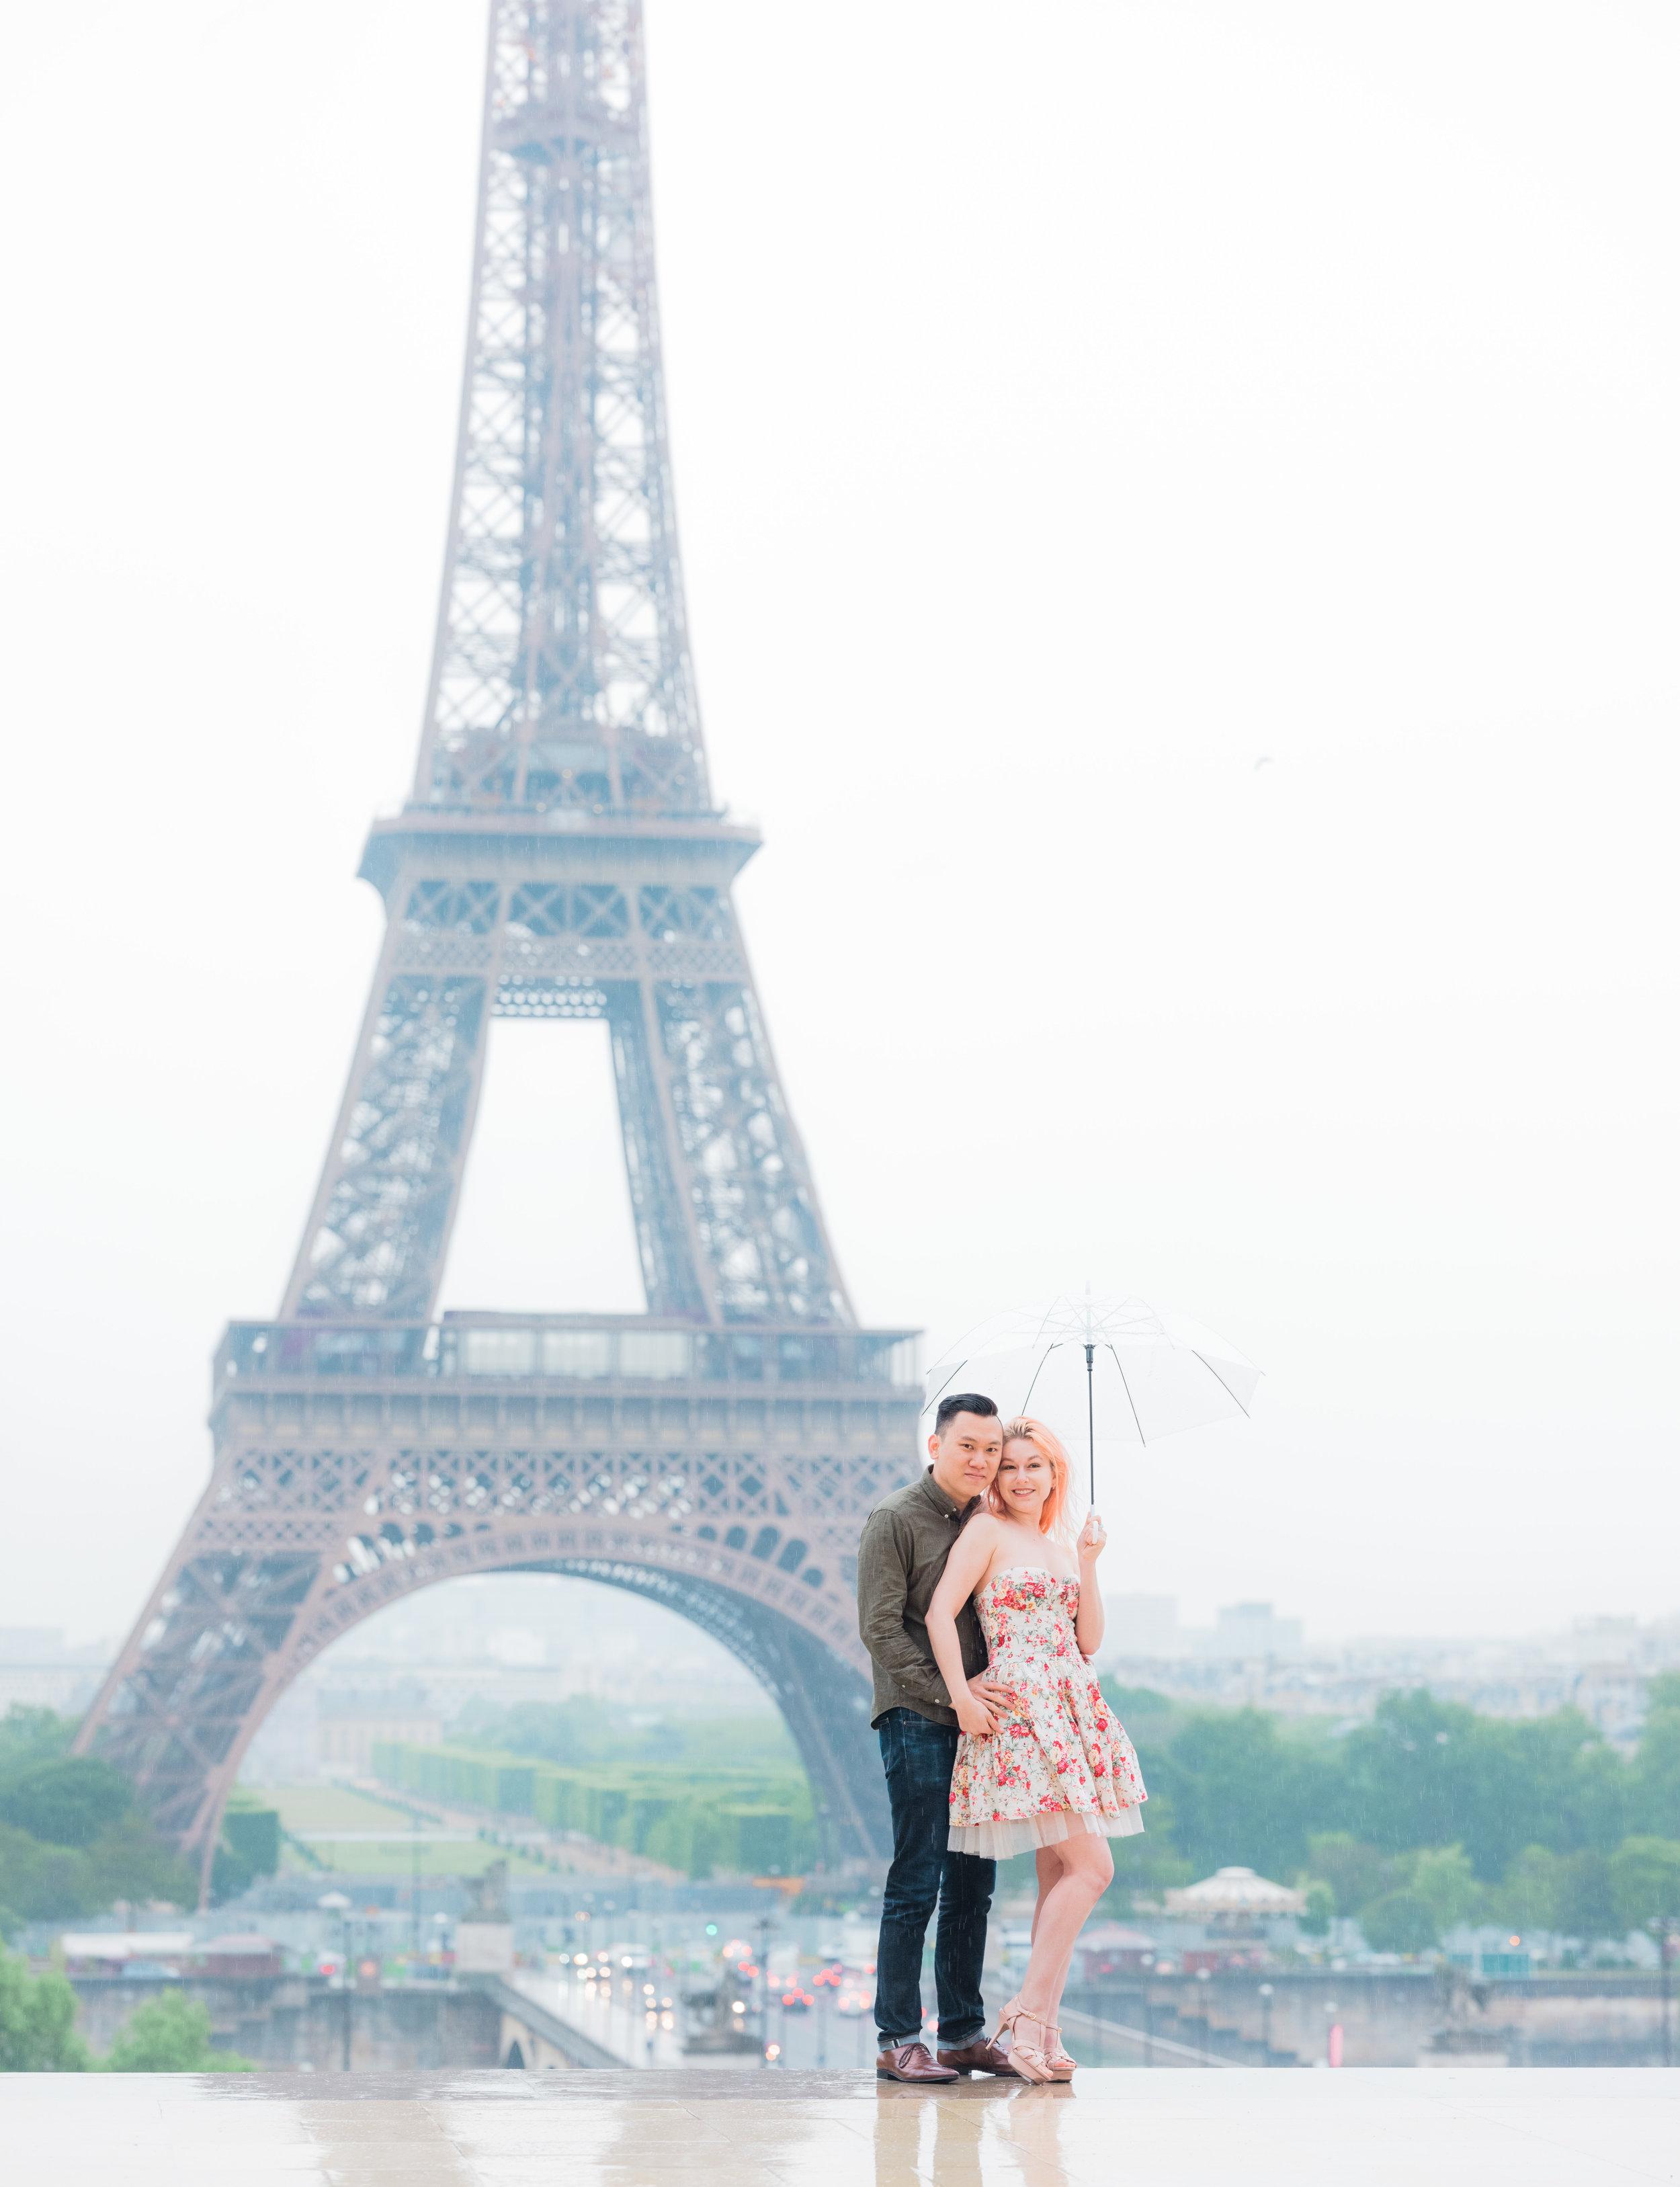 A fun, flirty and rainy day Trocadero Eiffel Tower photo session